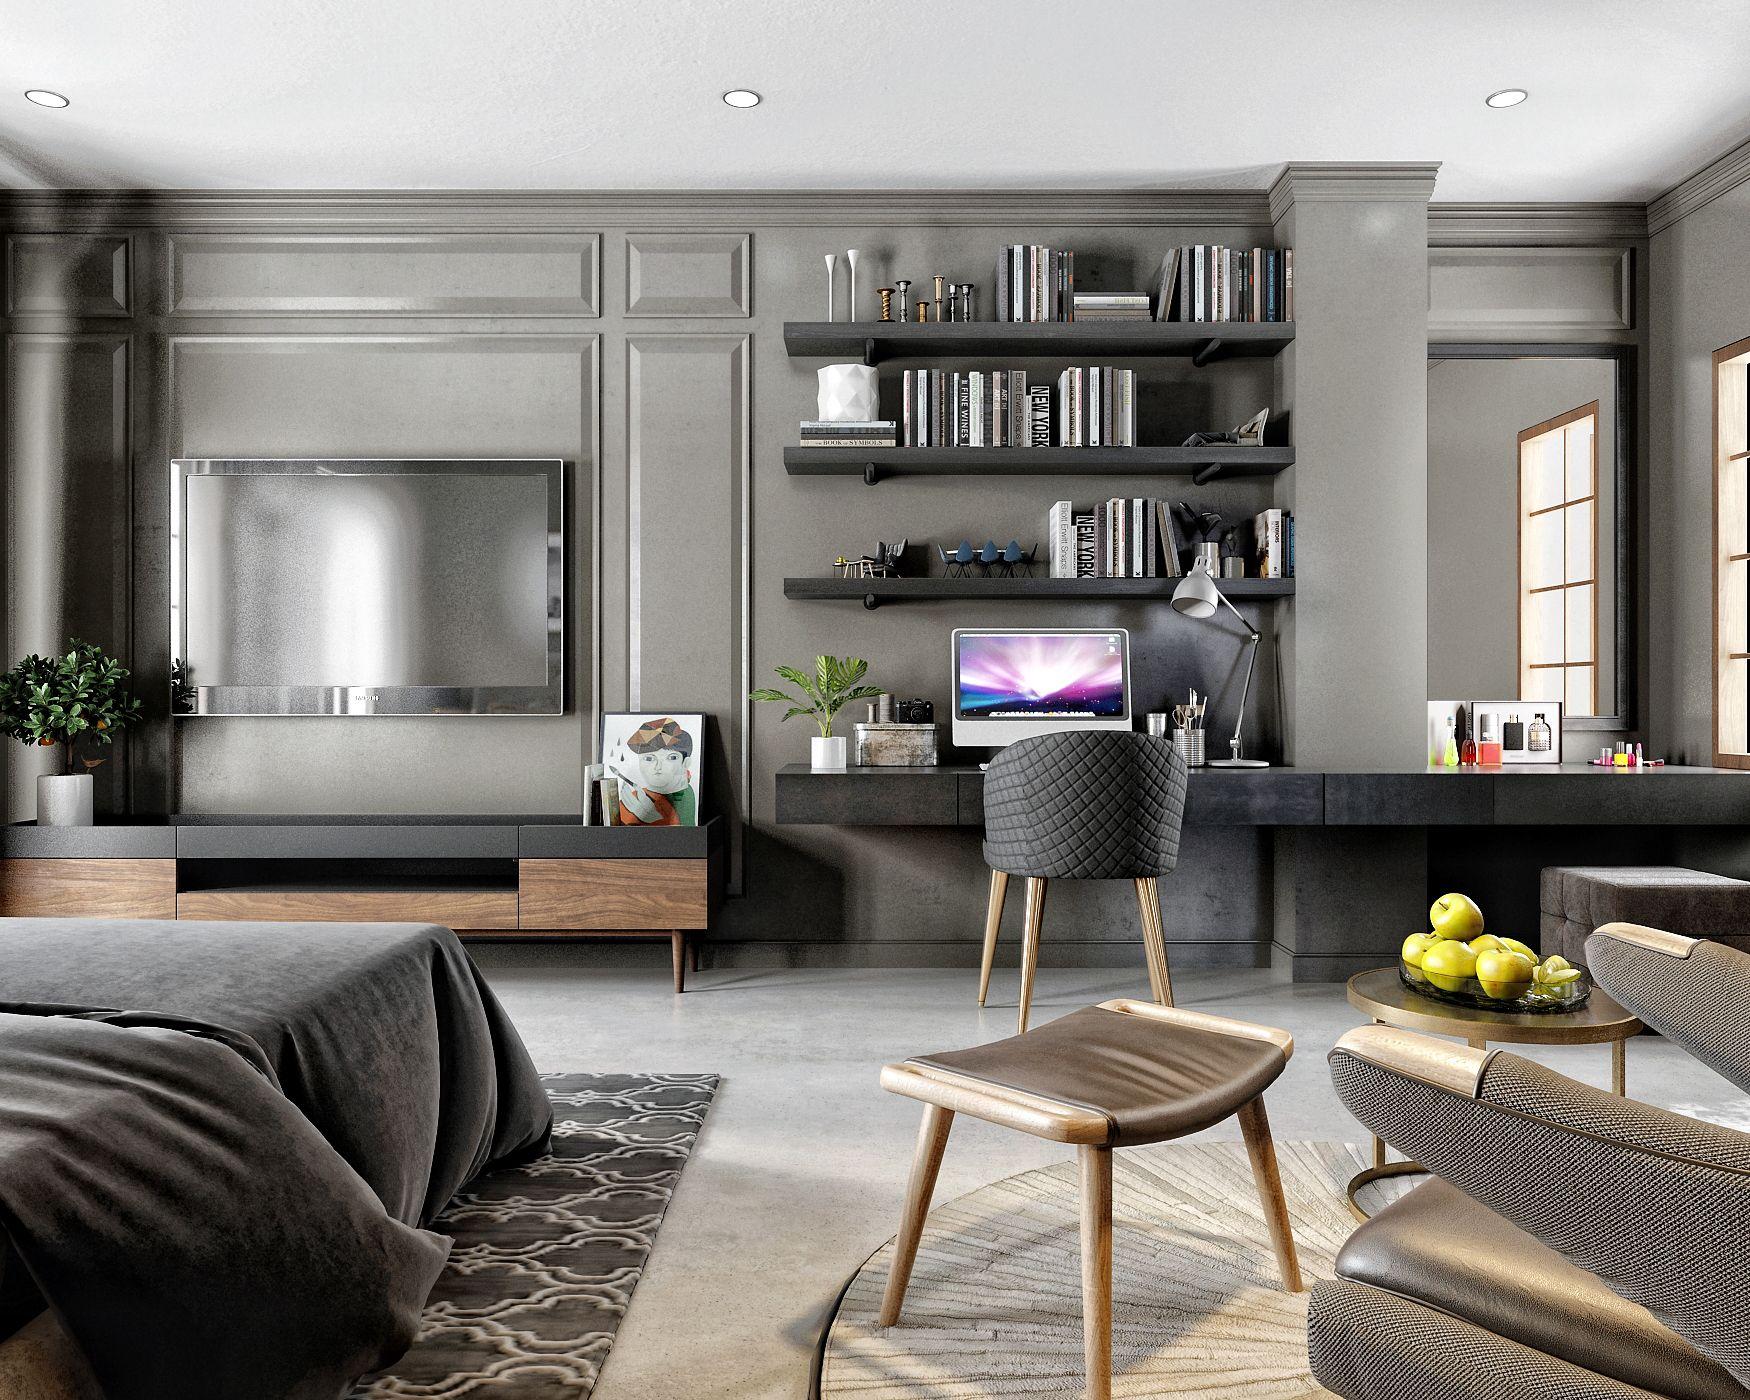 New bedroom interior design master bedroom  rack  pinterest  master bedroom bed room and